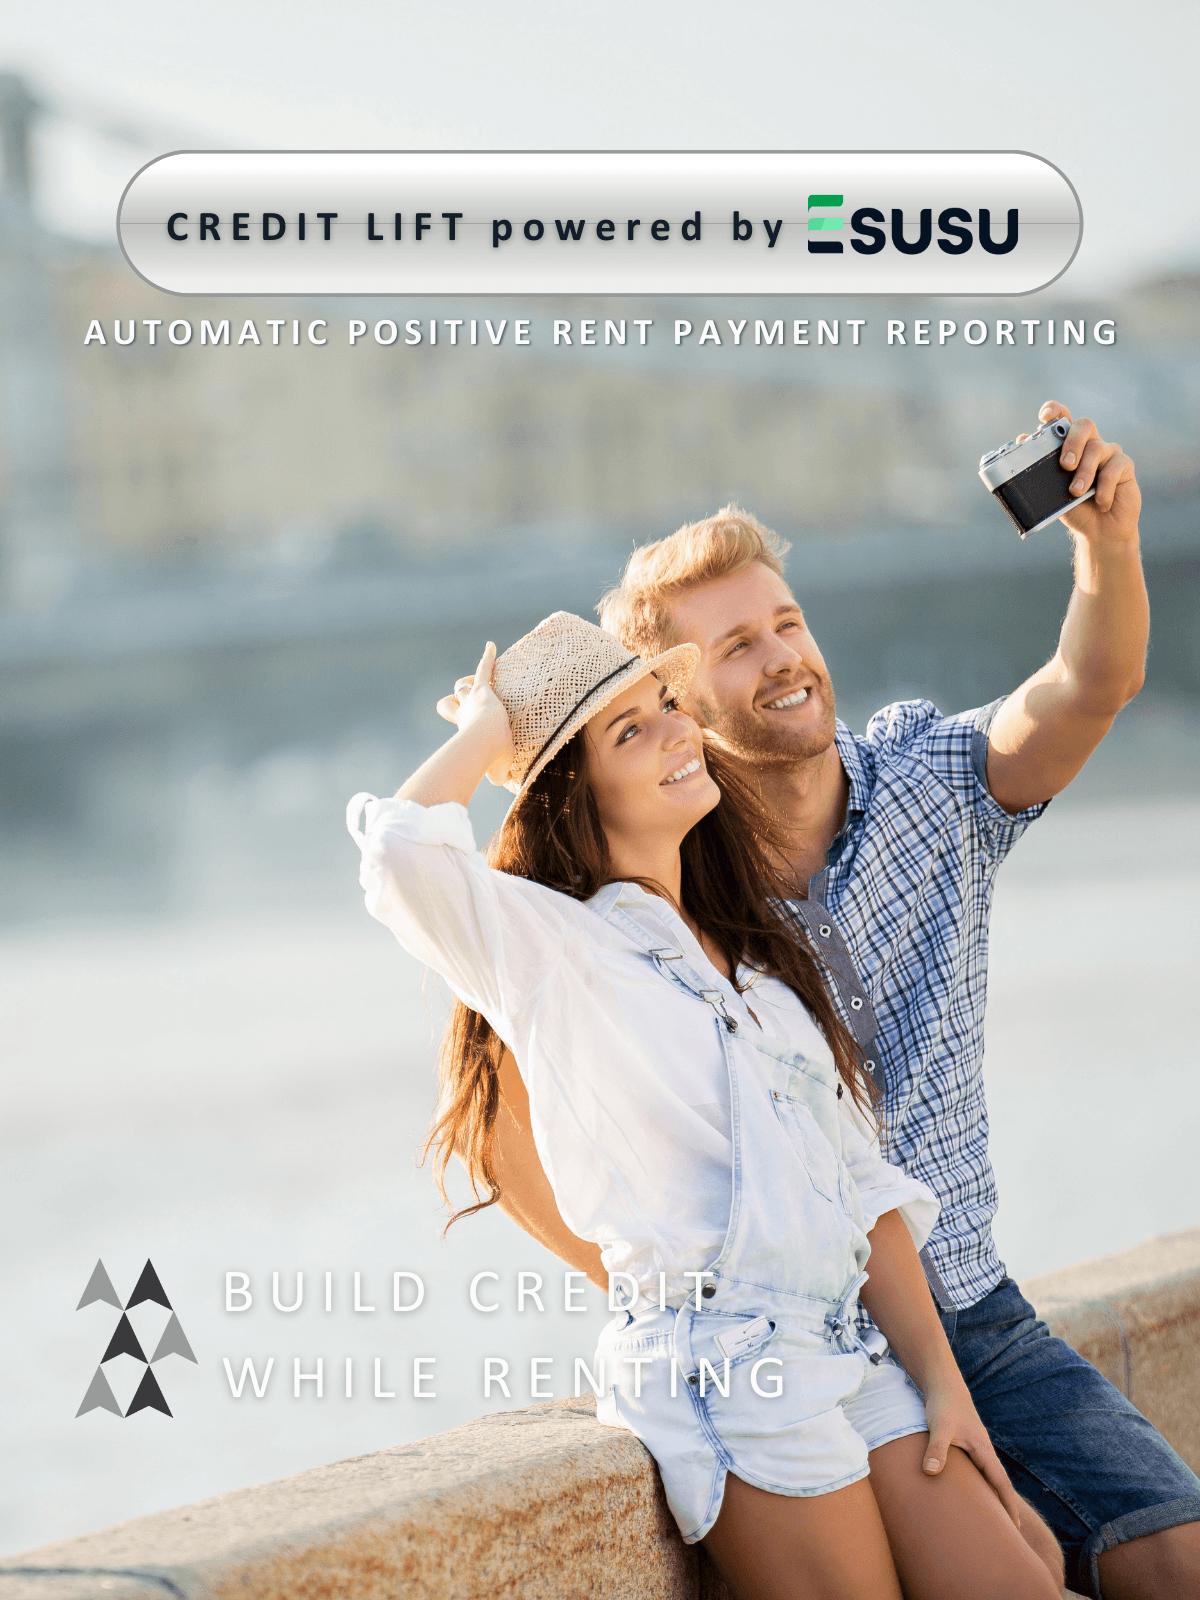 Credit Lift powered by Esusu